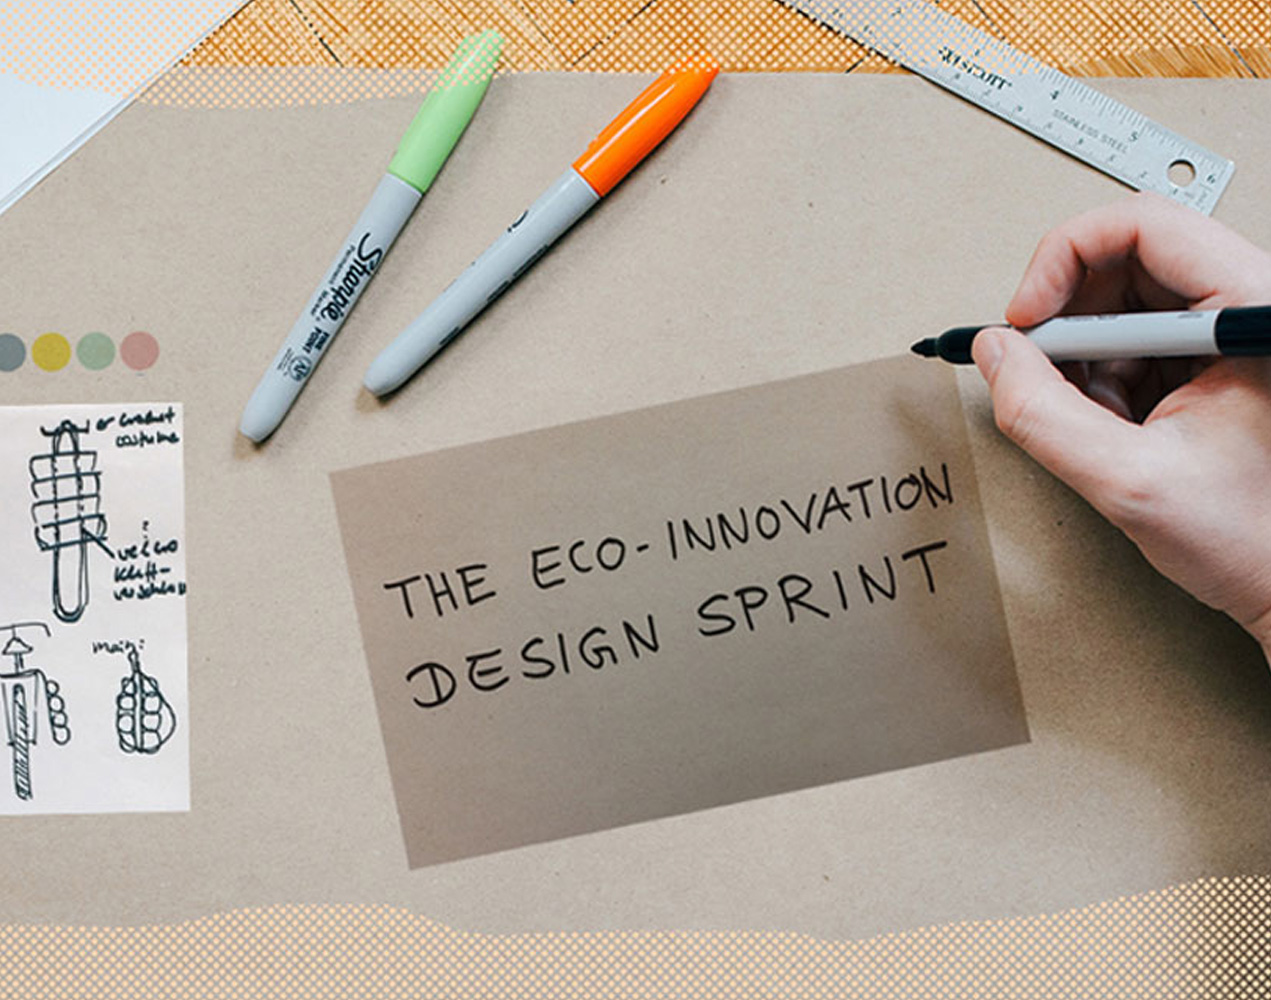 The Eco-innovation Design Sprint